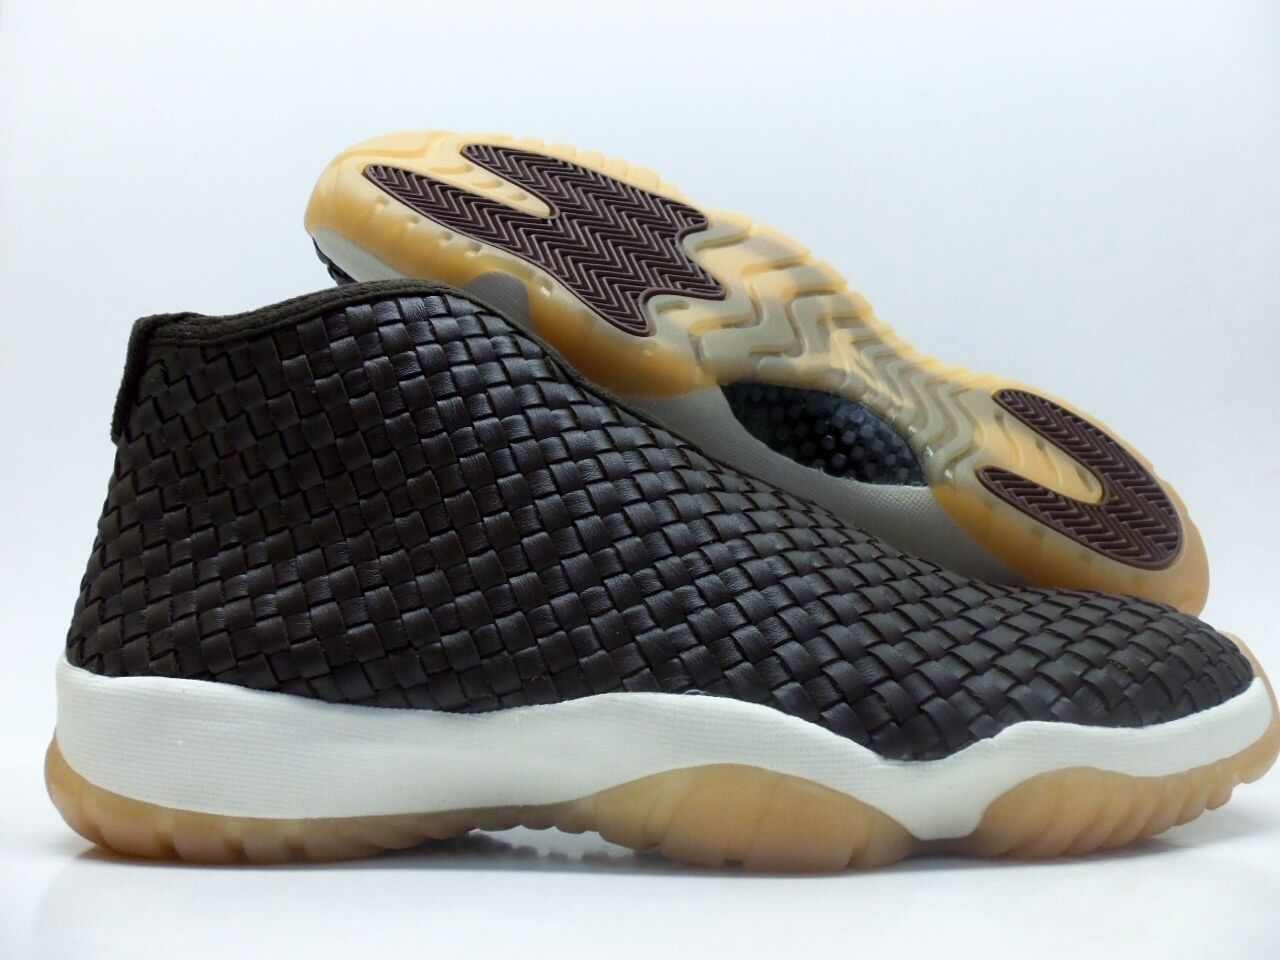 Nike air jordan zukunft premium größe dunkle schokolade / segel größe premium männer 10,5 [652141-219] 403524